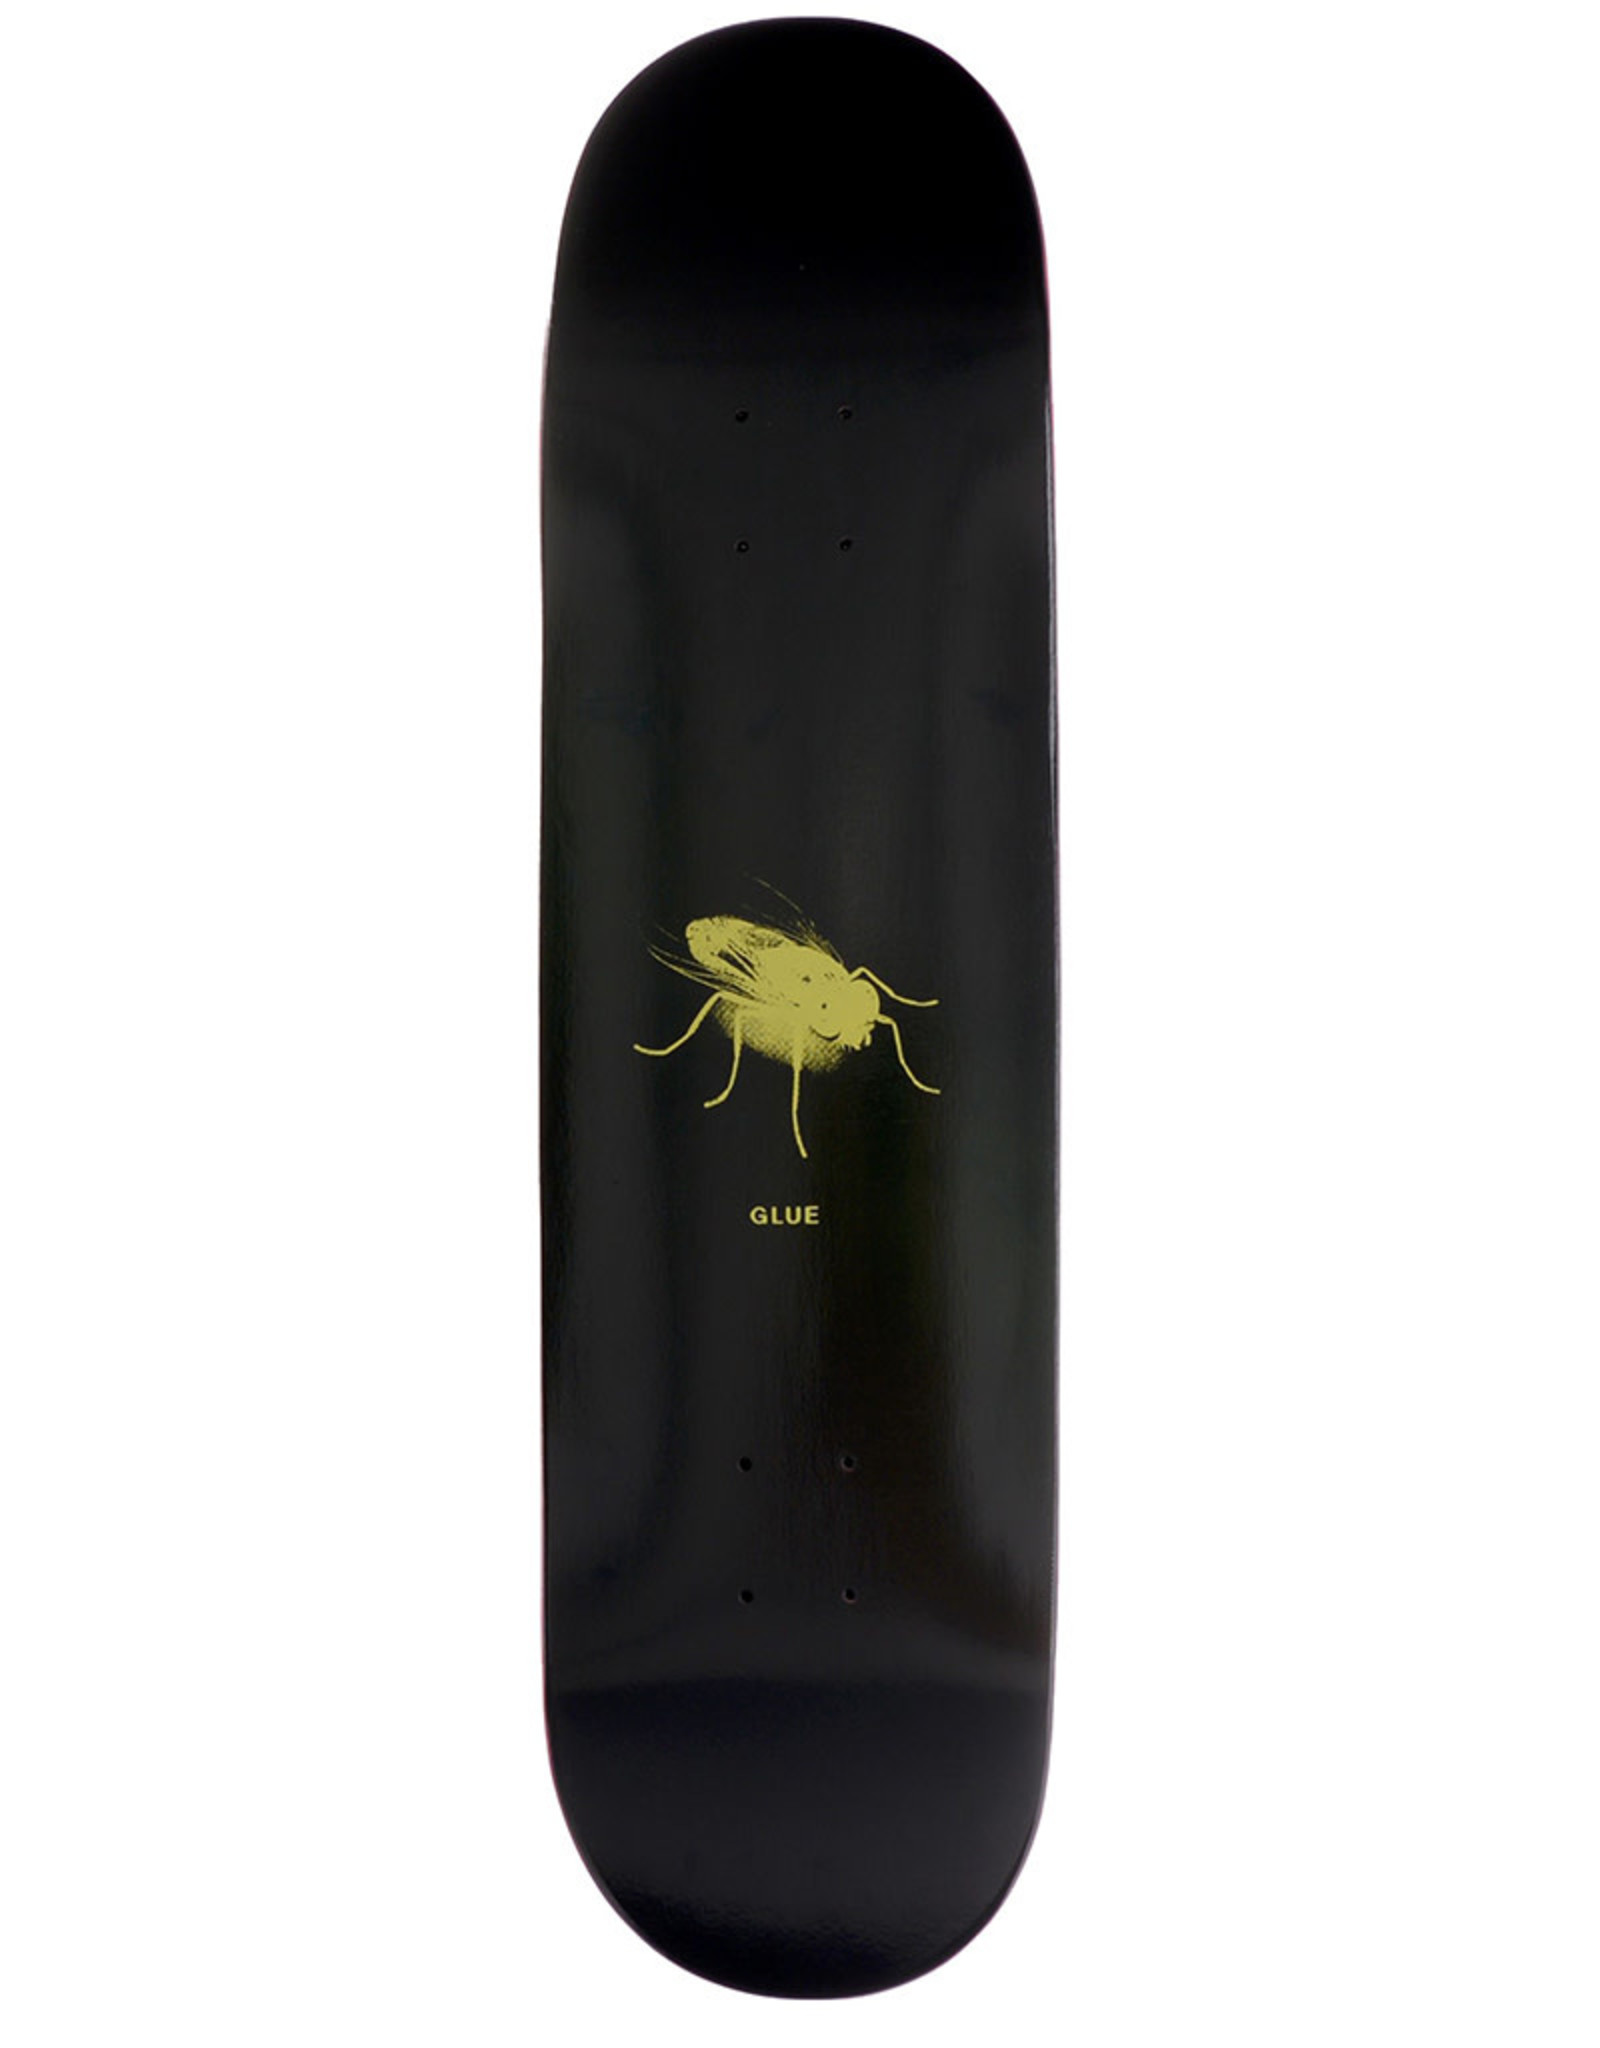 Glue Skateboards Glue Deck Team Fly Yellow (8.0)